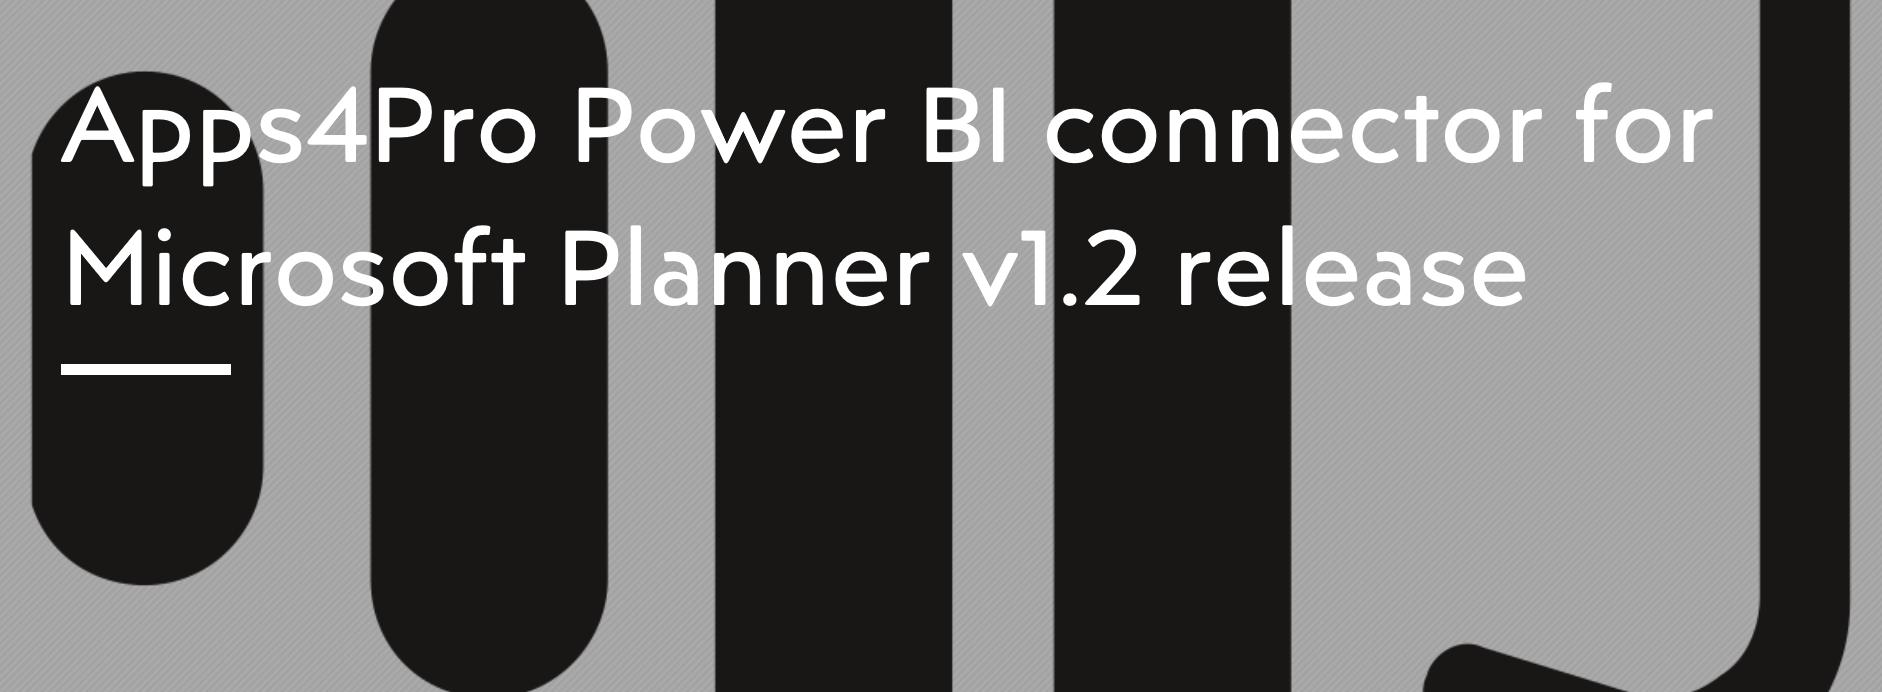 Power BI connector for Microsoft Planner